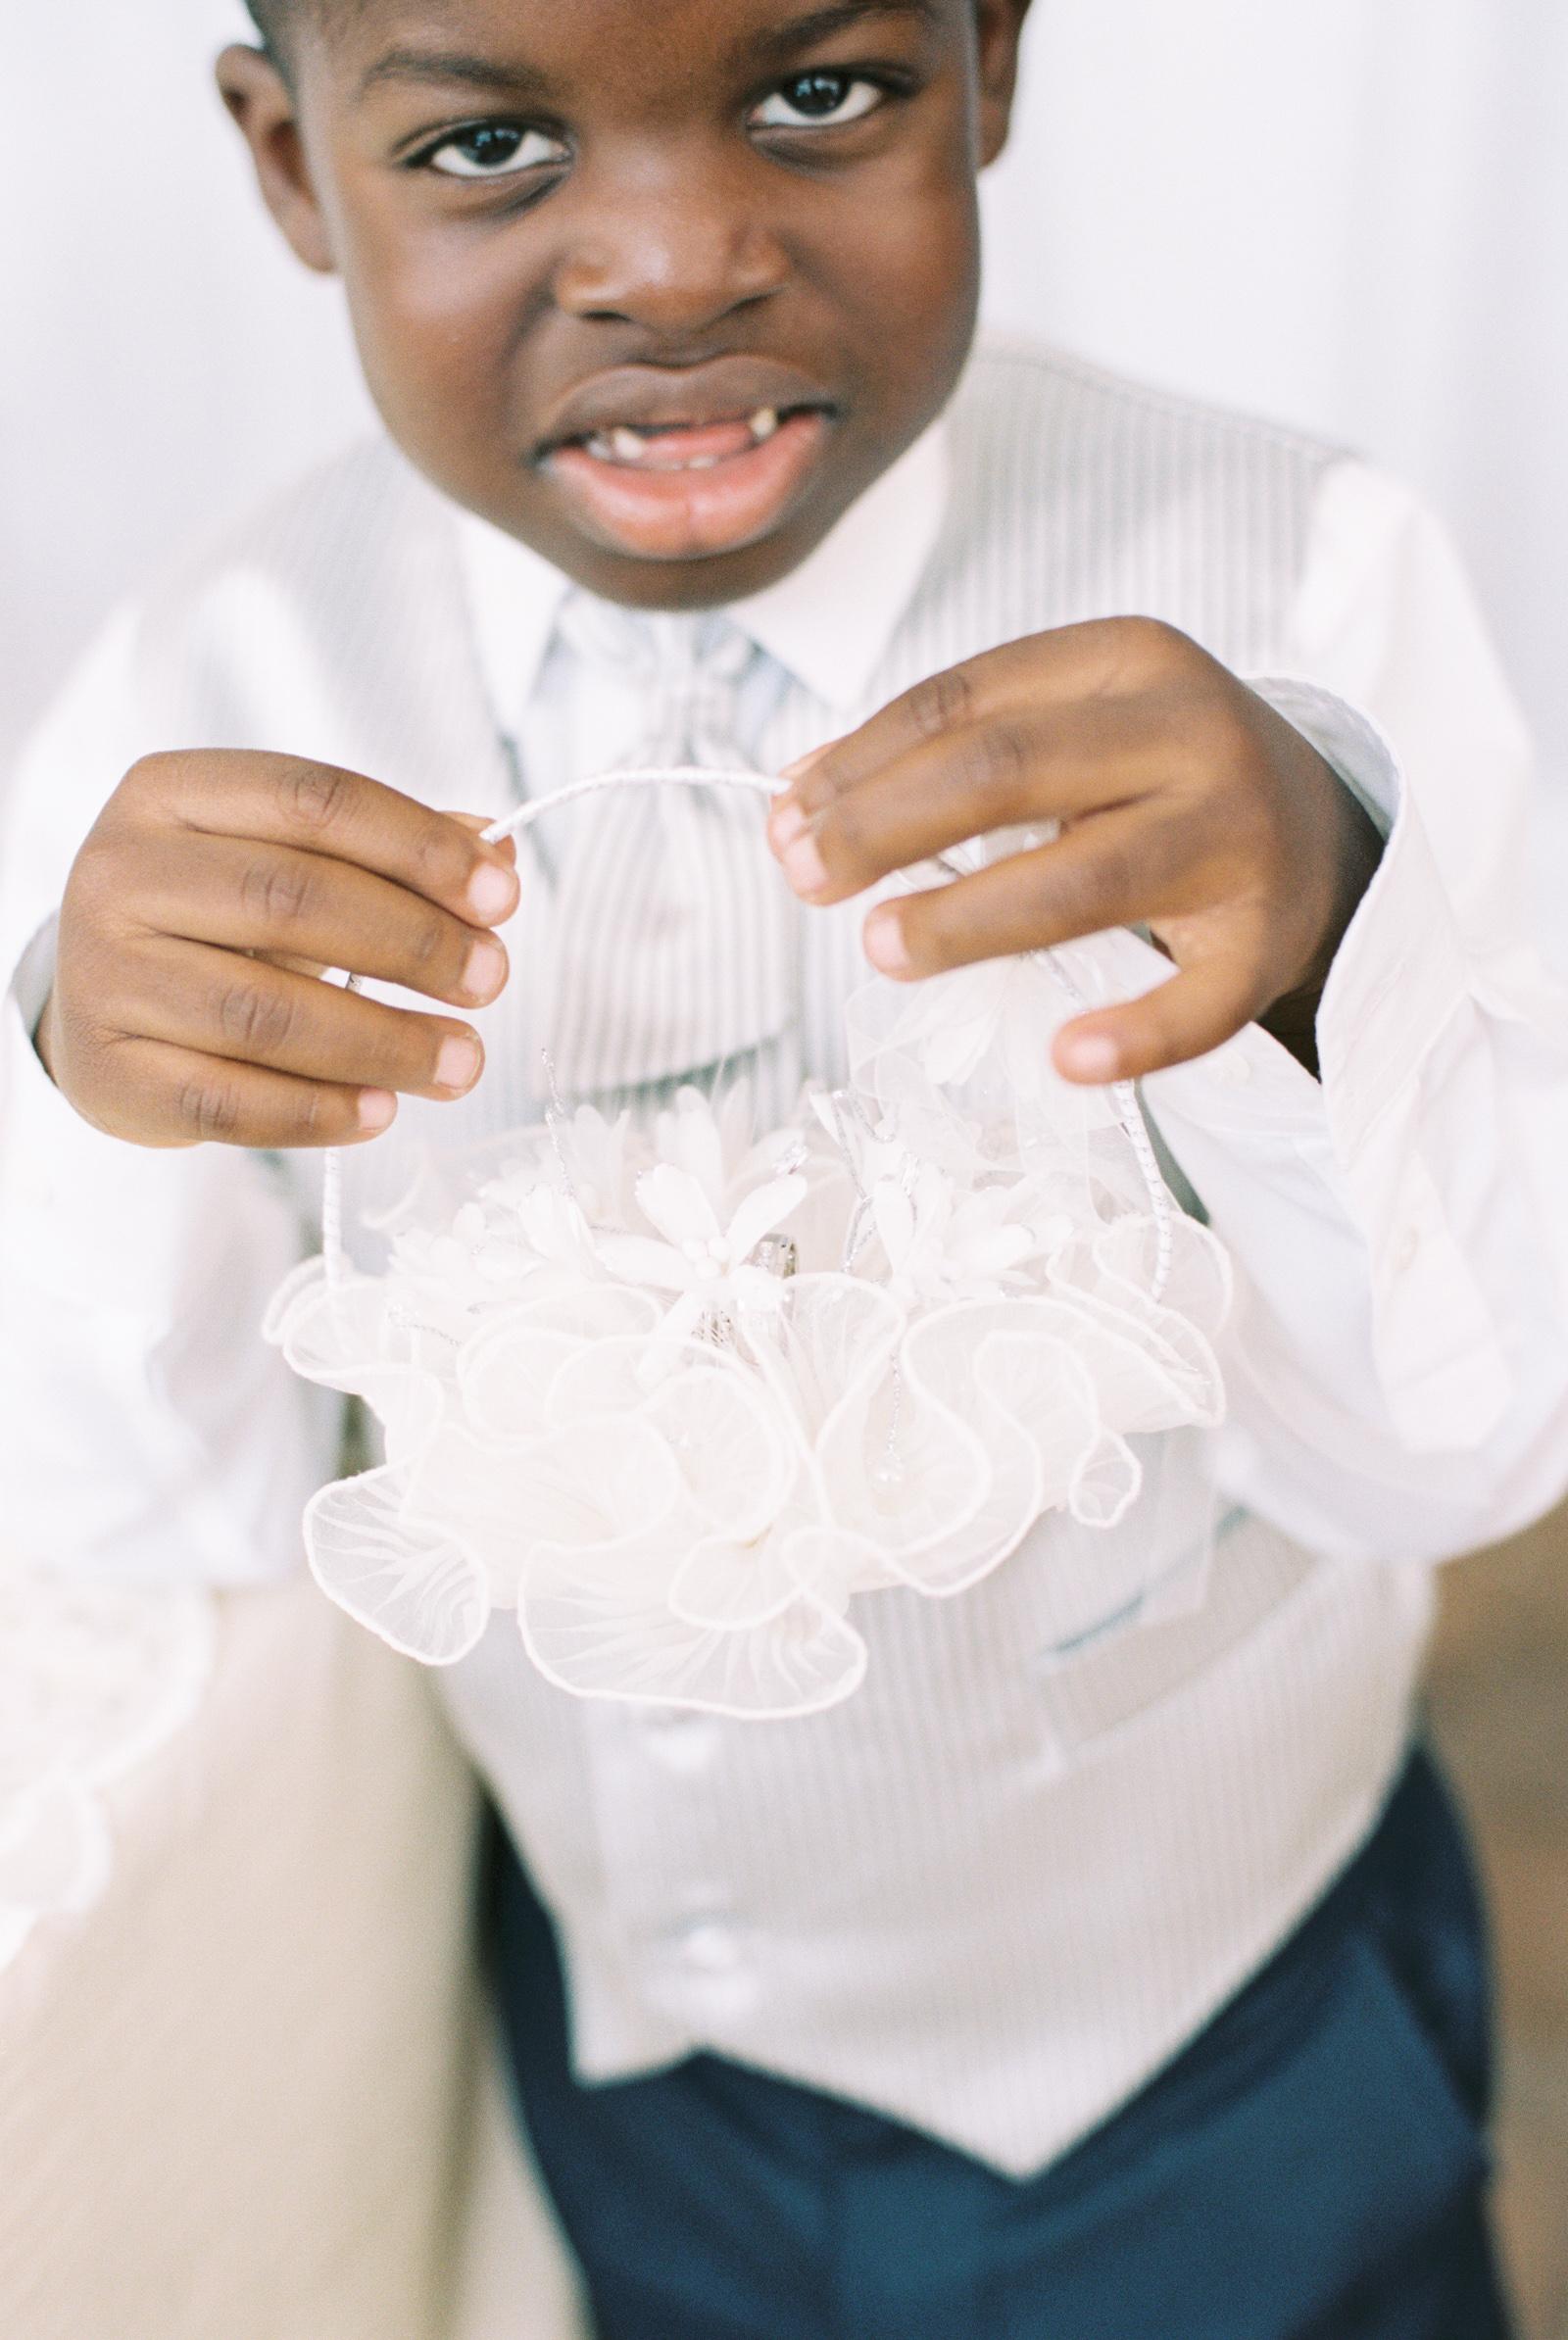 0056_Royal_Oaks_Country_Club_Wedding.jpg